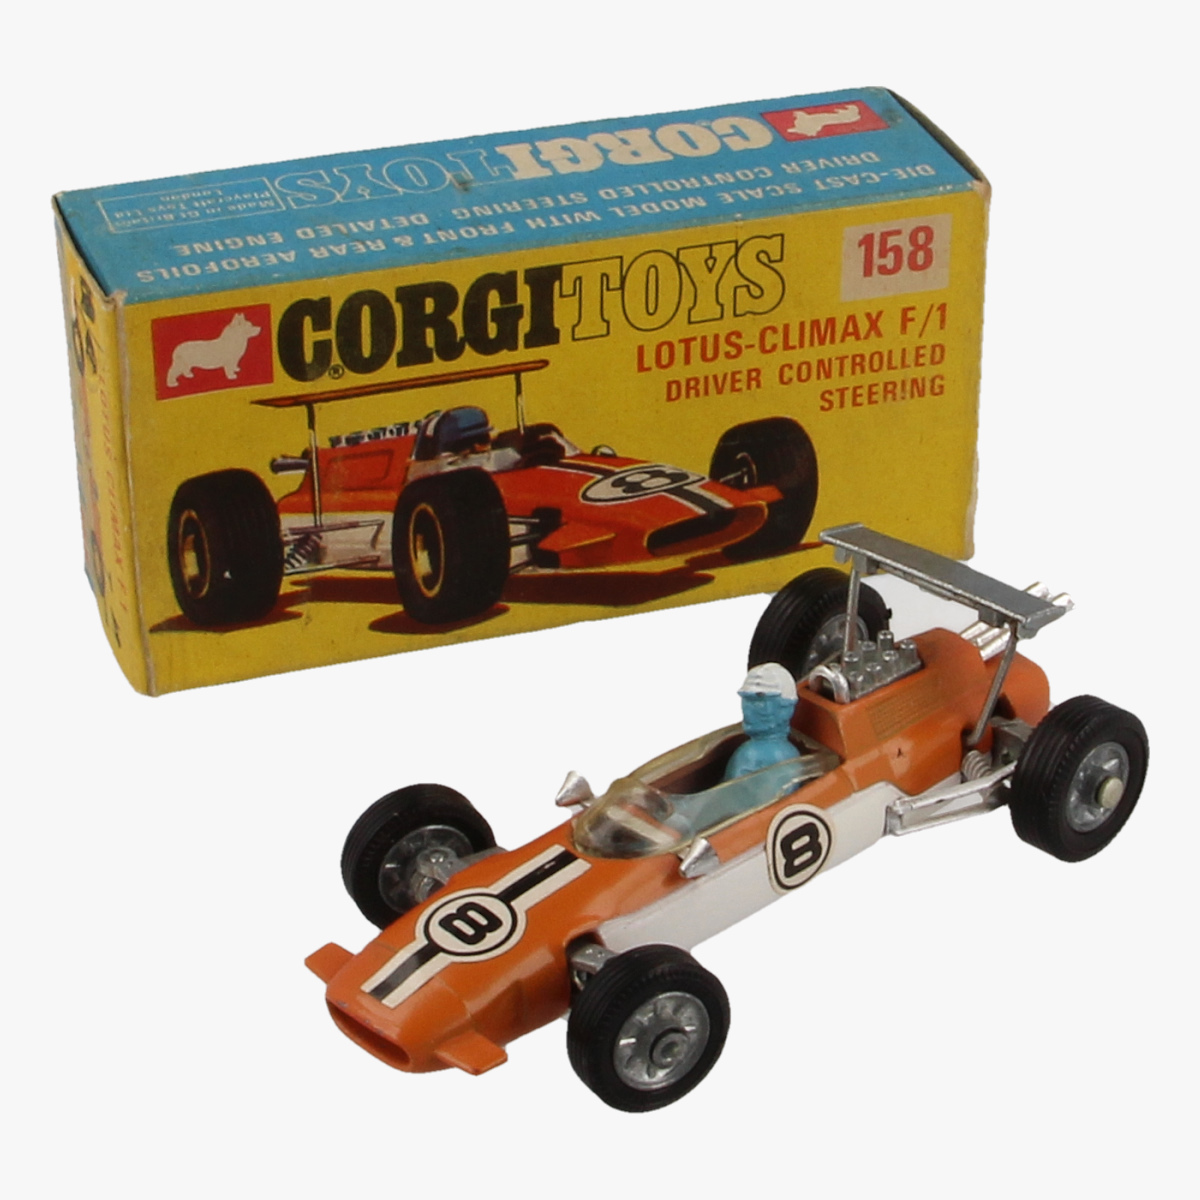 Afbeeldingen van Corgi Toys. Lotus Climax F/1. Nr. 158